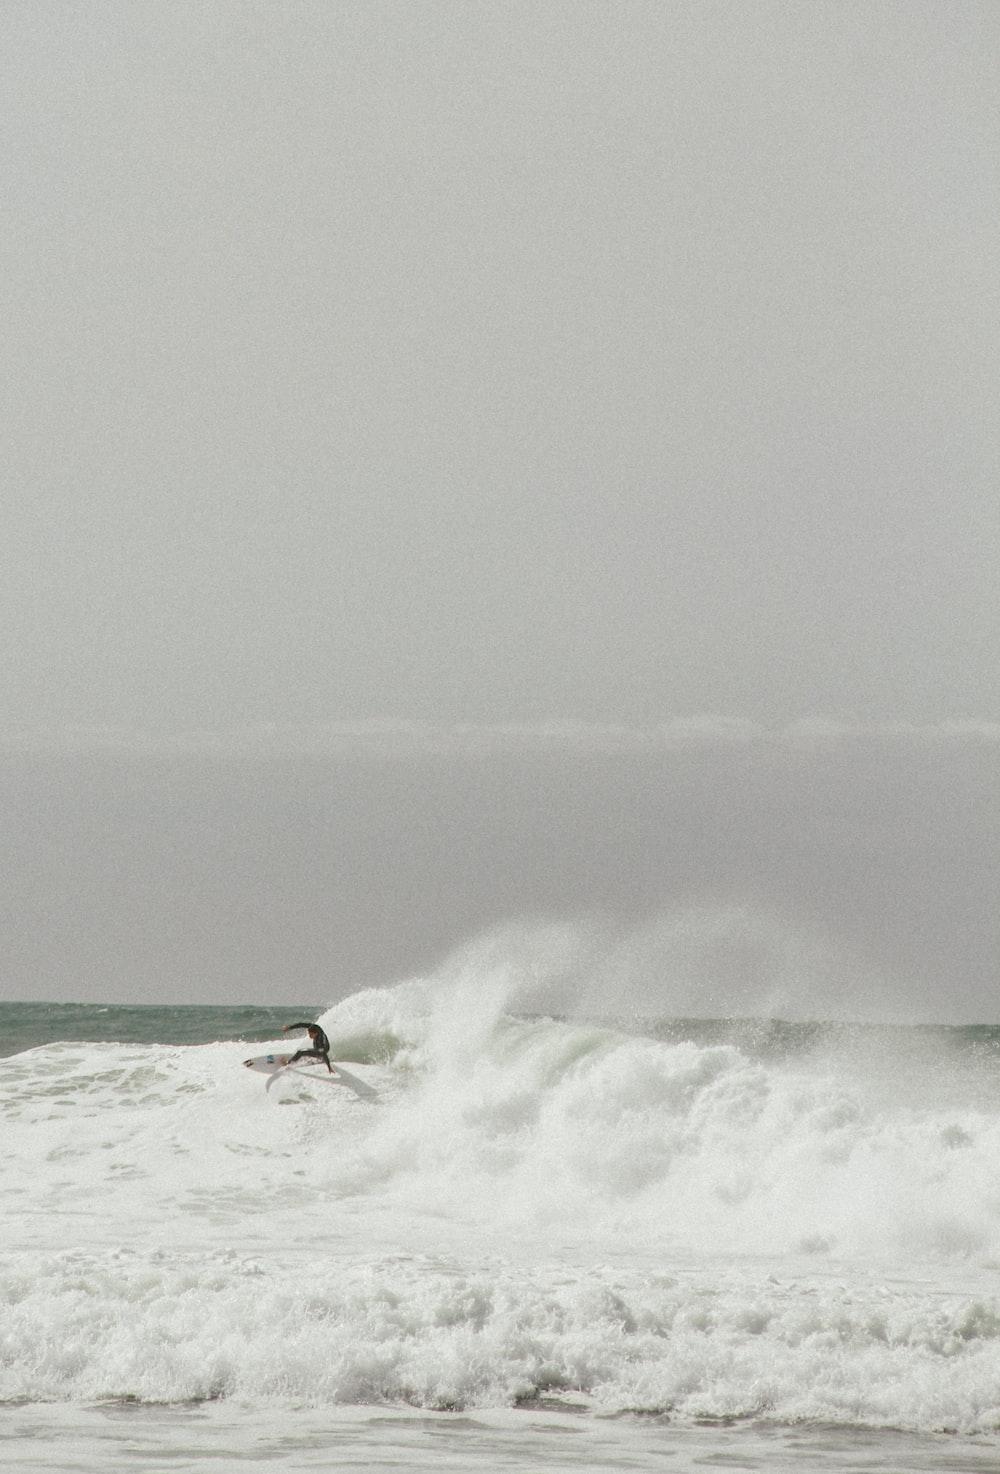 surfing man on huge waves